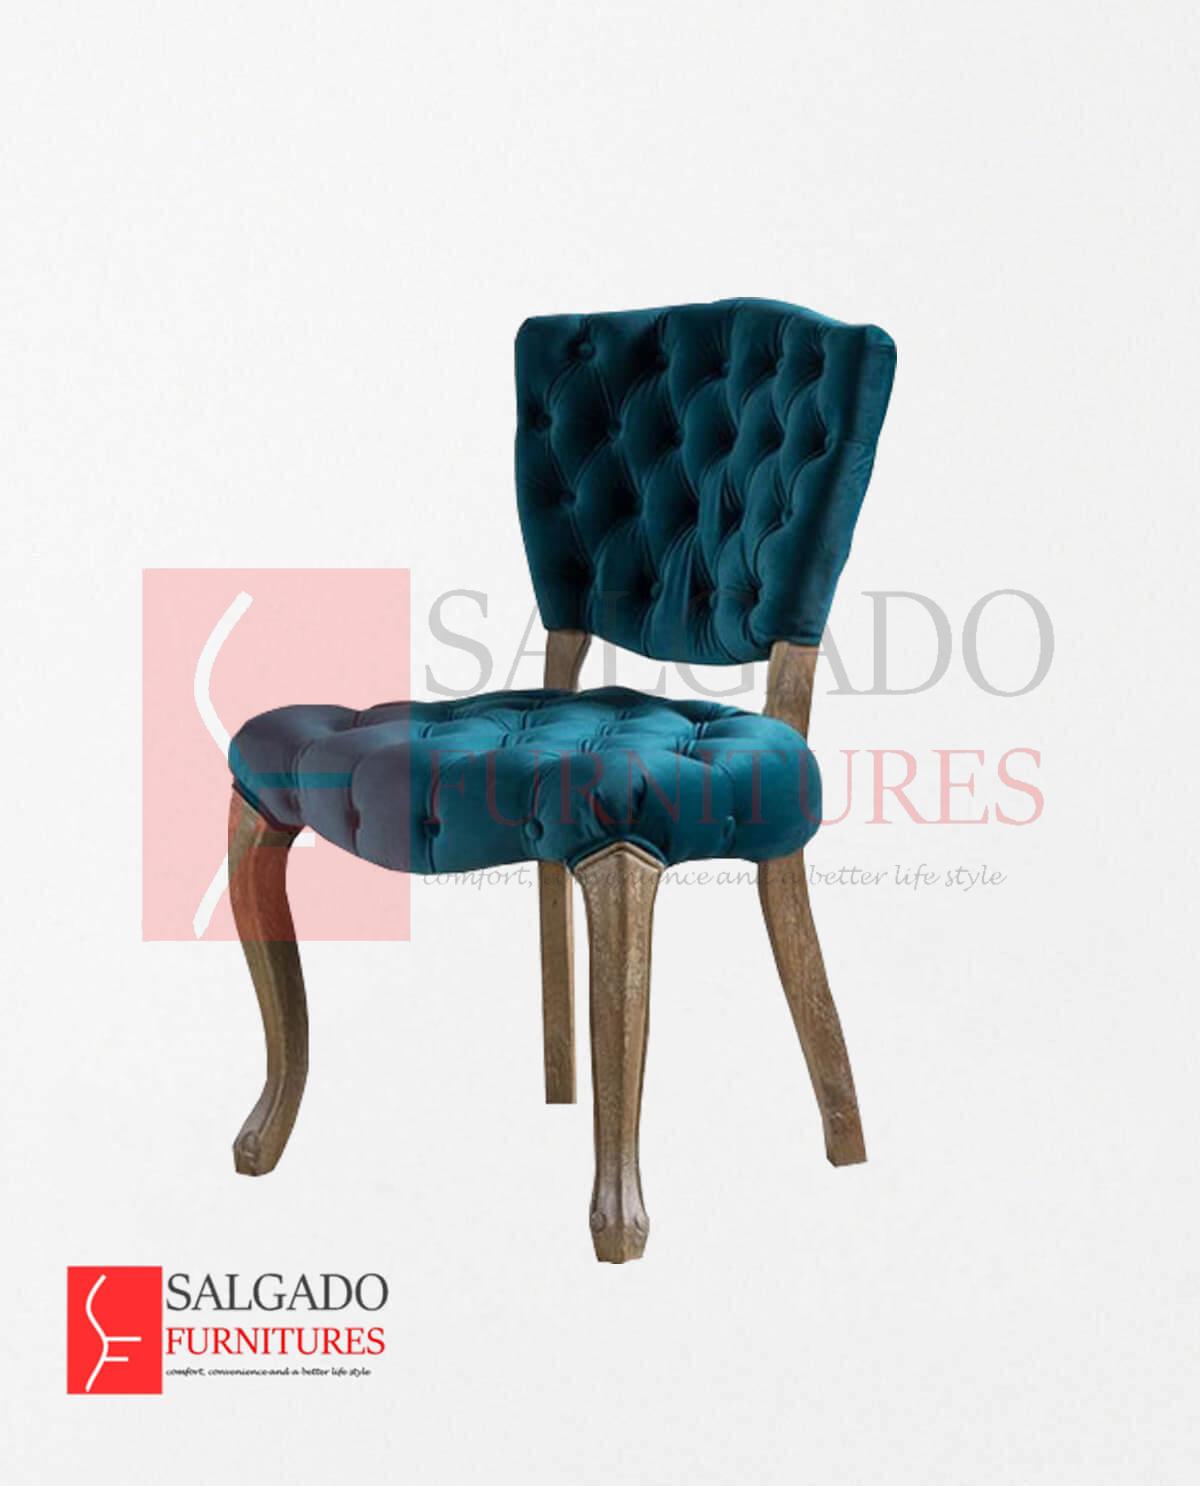 moratuwa furniture